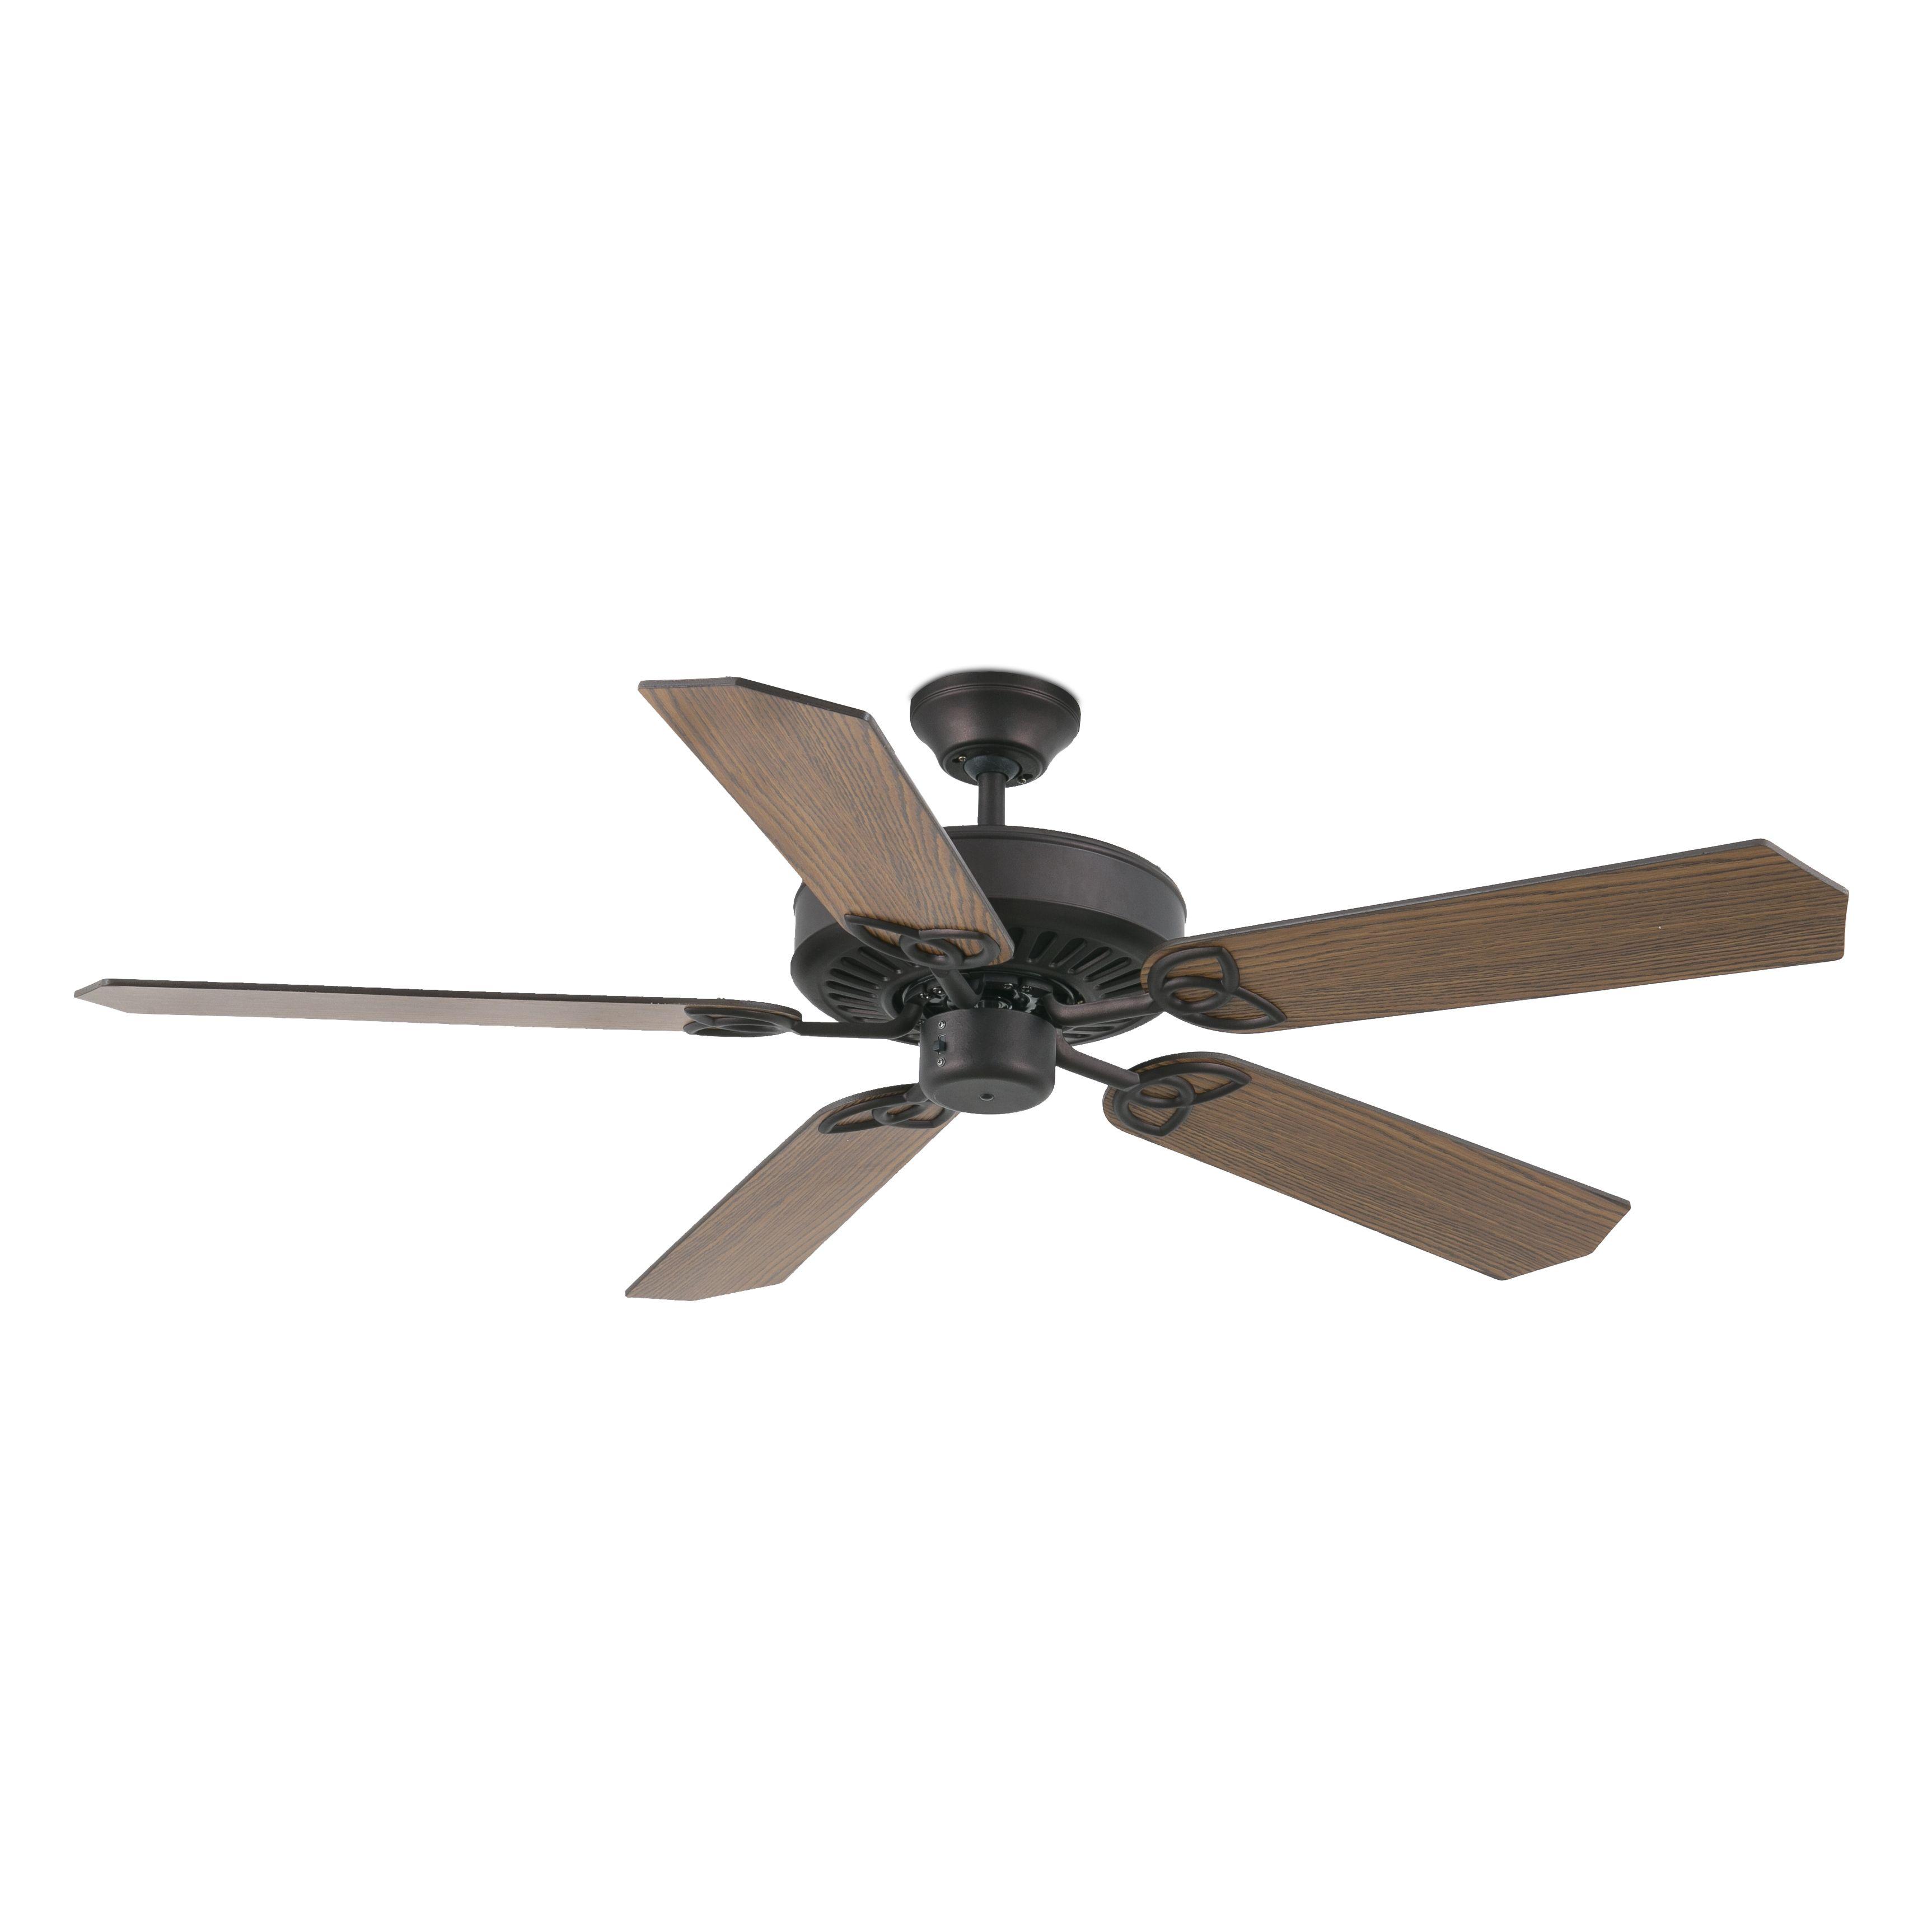 ventilador de techo mauritius fans ventiladores en. Black Bedroom Furniture Sets. Home Design Ideas